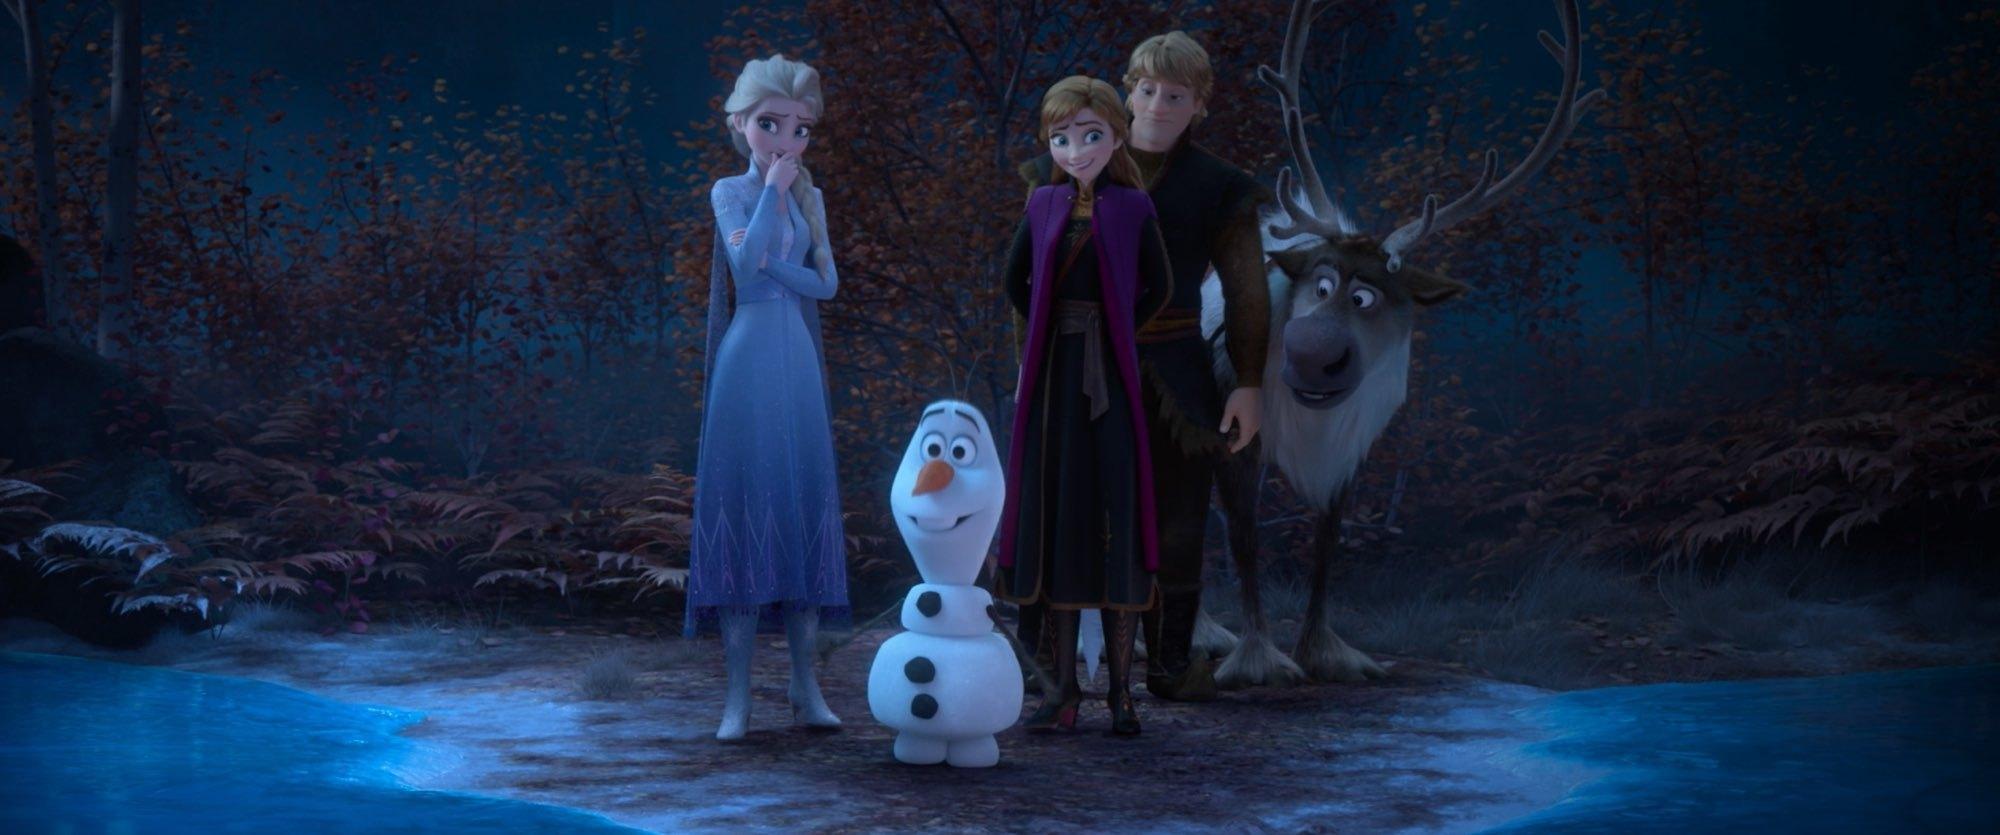 Frozen 2 Trailer - Calling